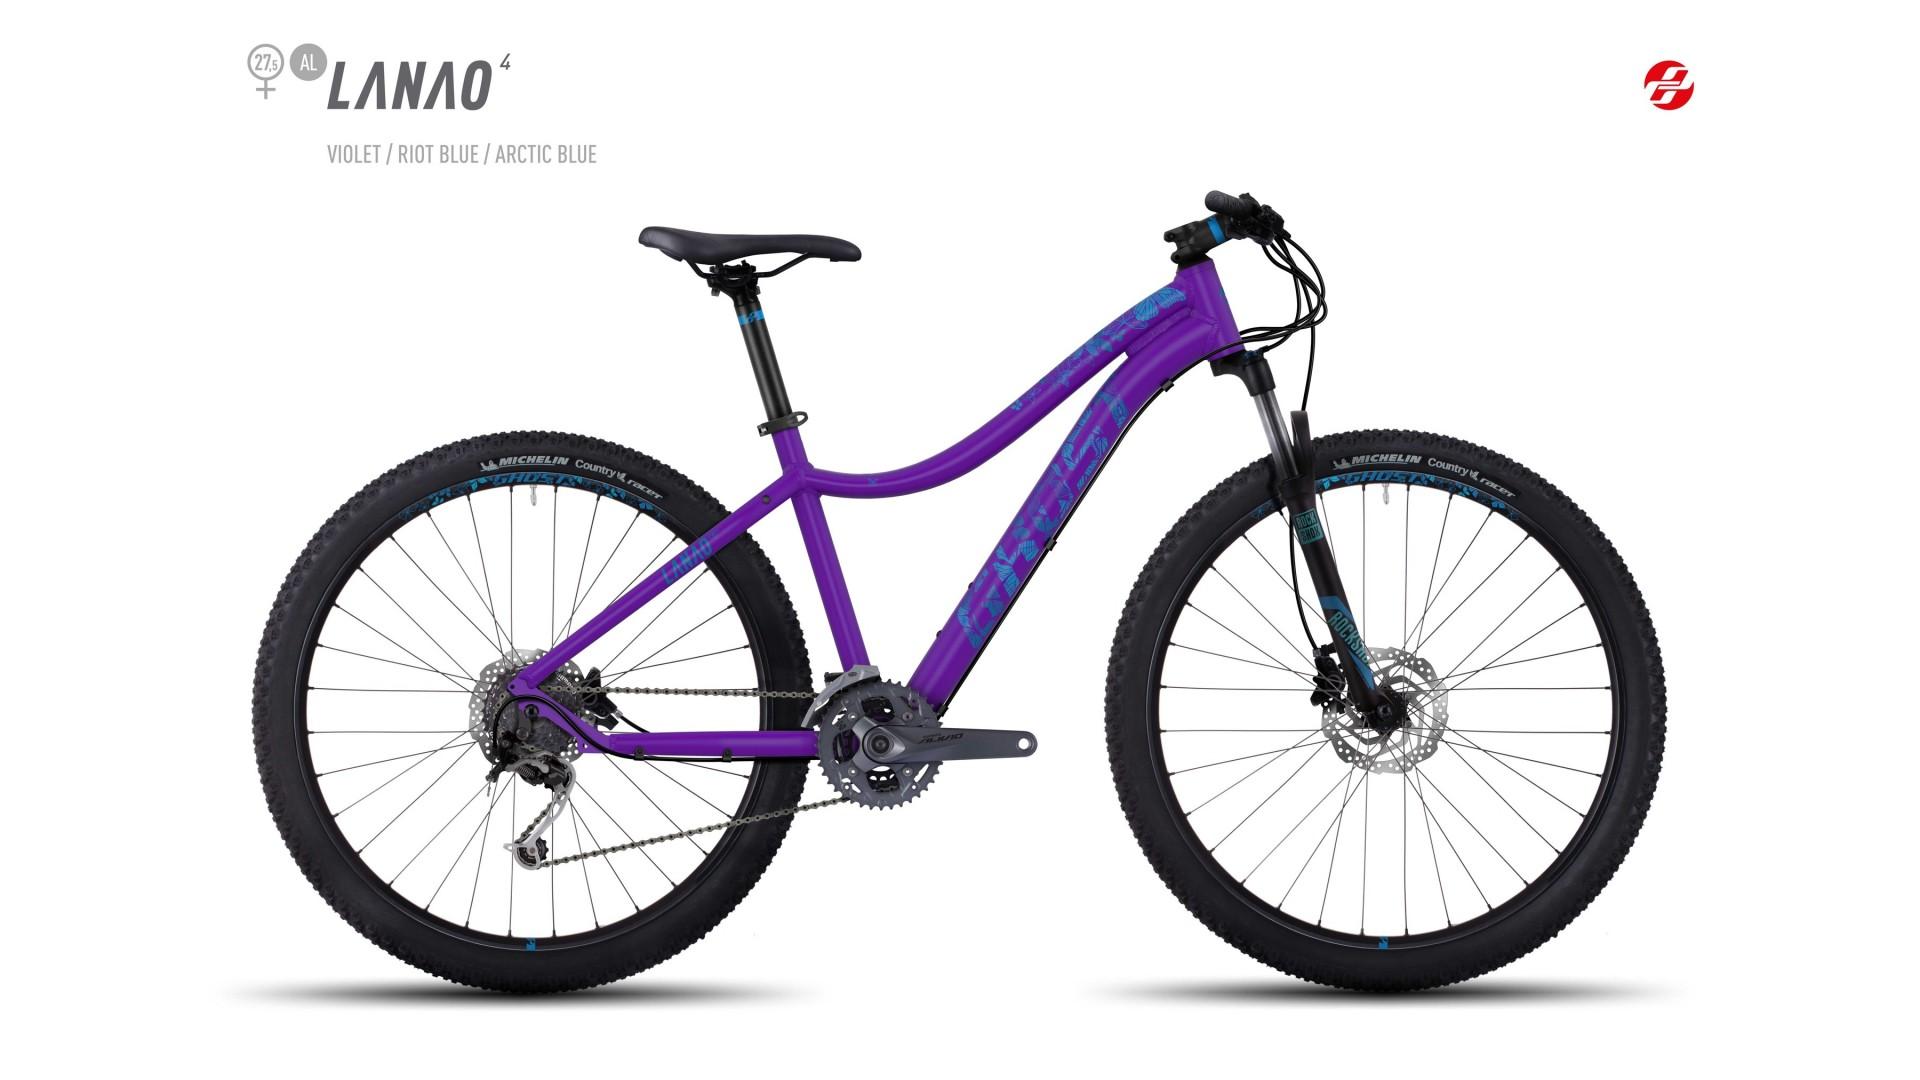 Велосипед GHOST Lanao 4 AL 27.5 violet/riotblue/arcticblue год 2017